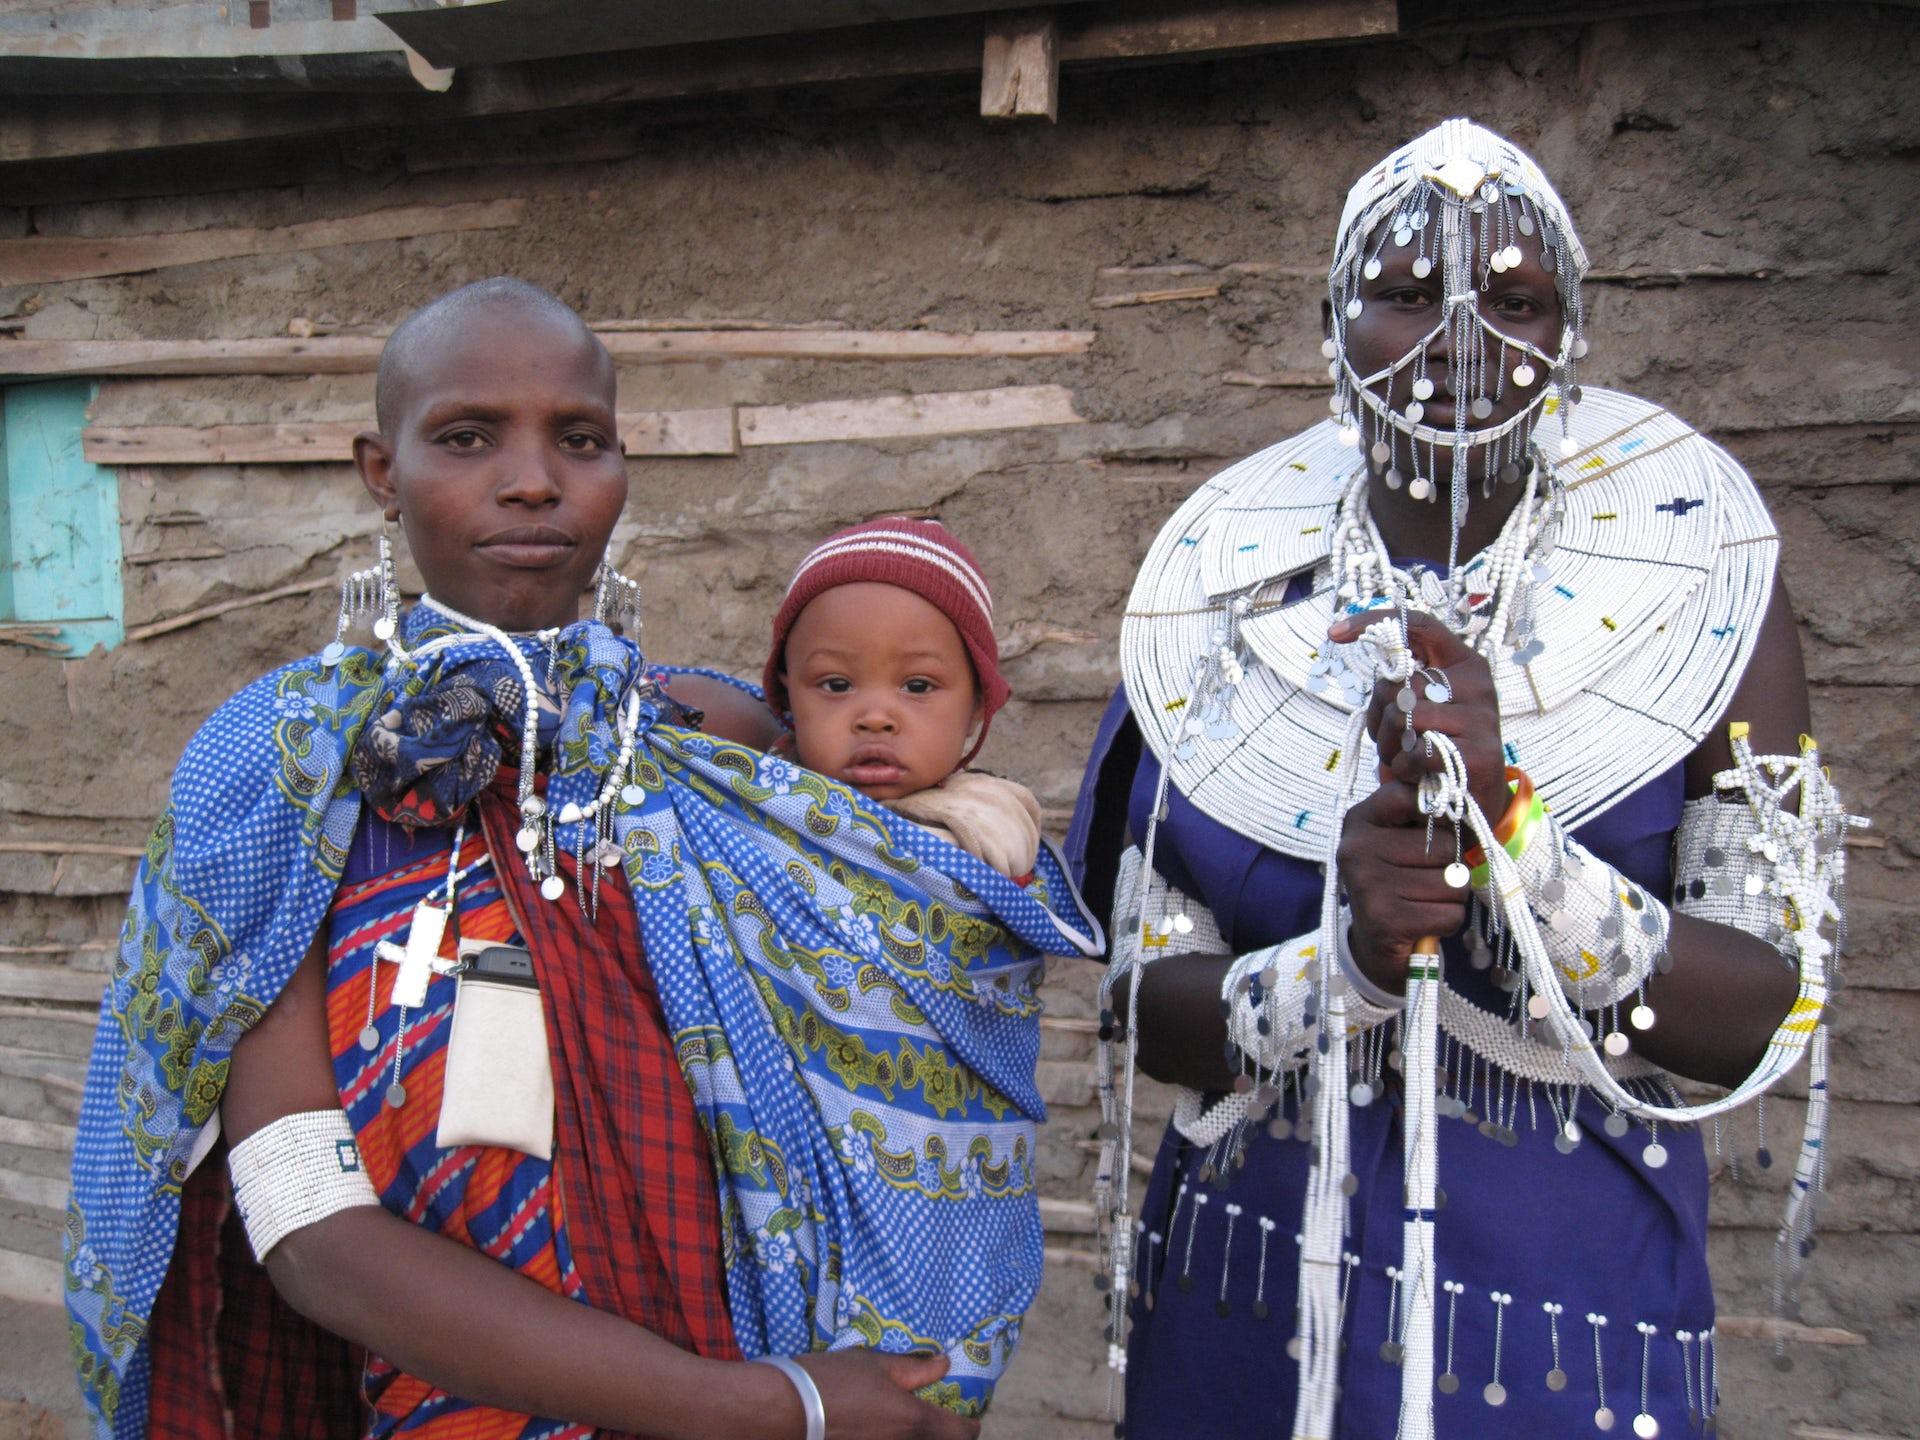 file 20170926 11782 79ytrp.JPG?ixlib=rb 1.1 - Maasai beads: the interplay between Europe and Africa